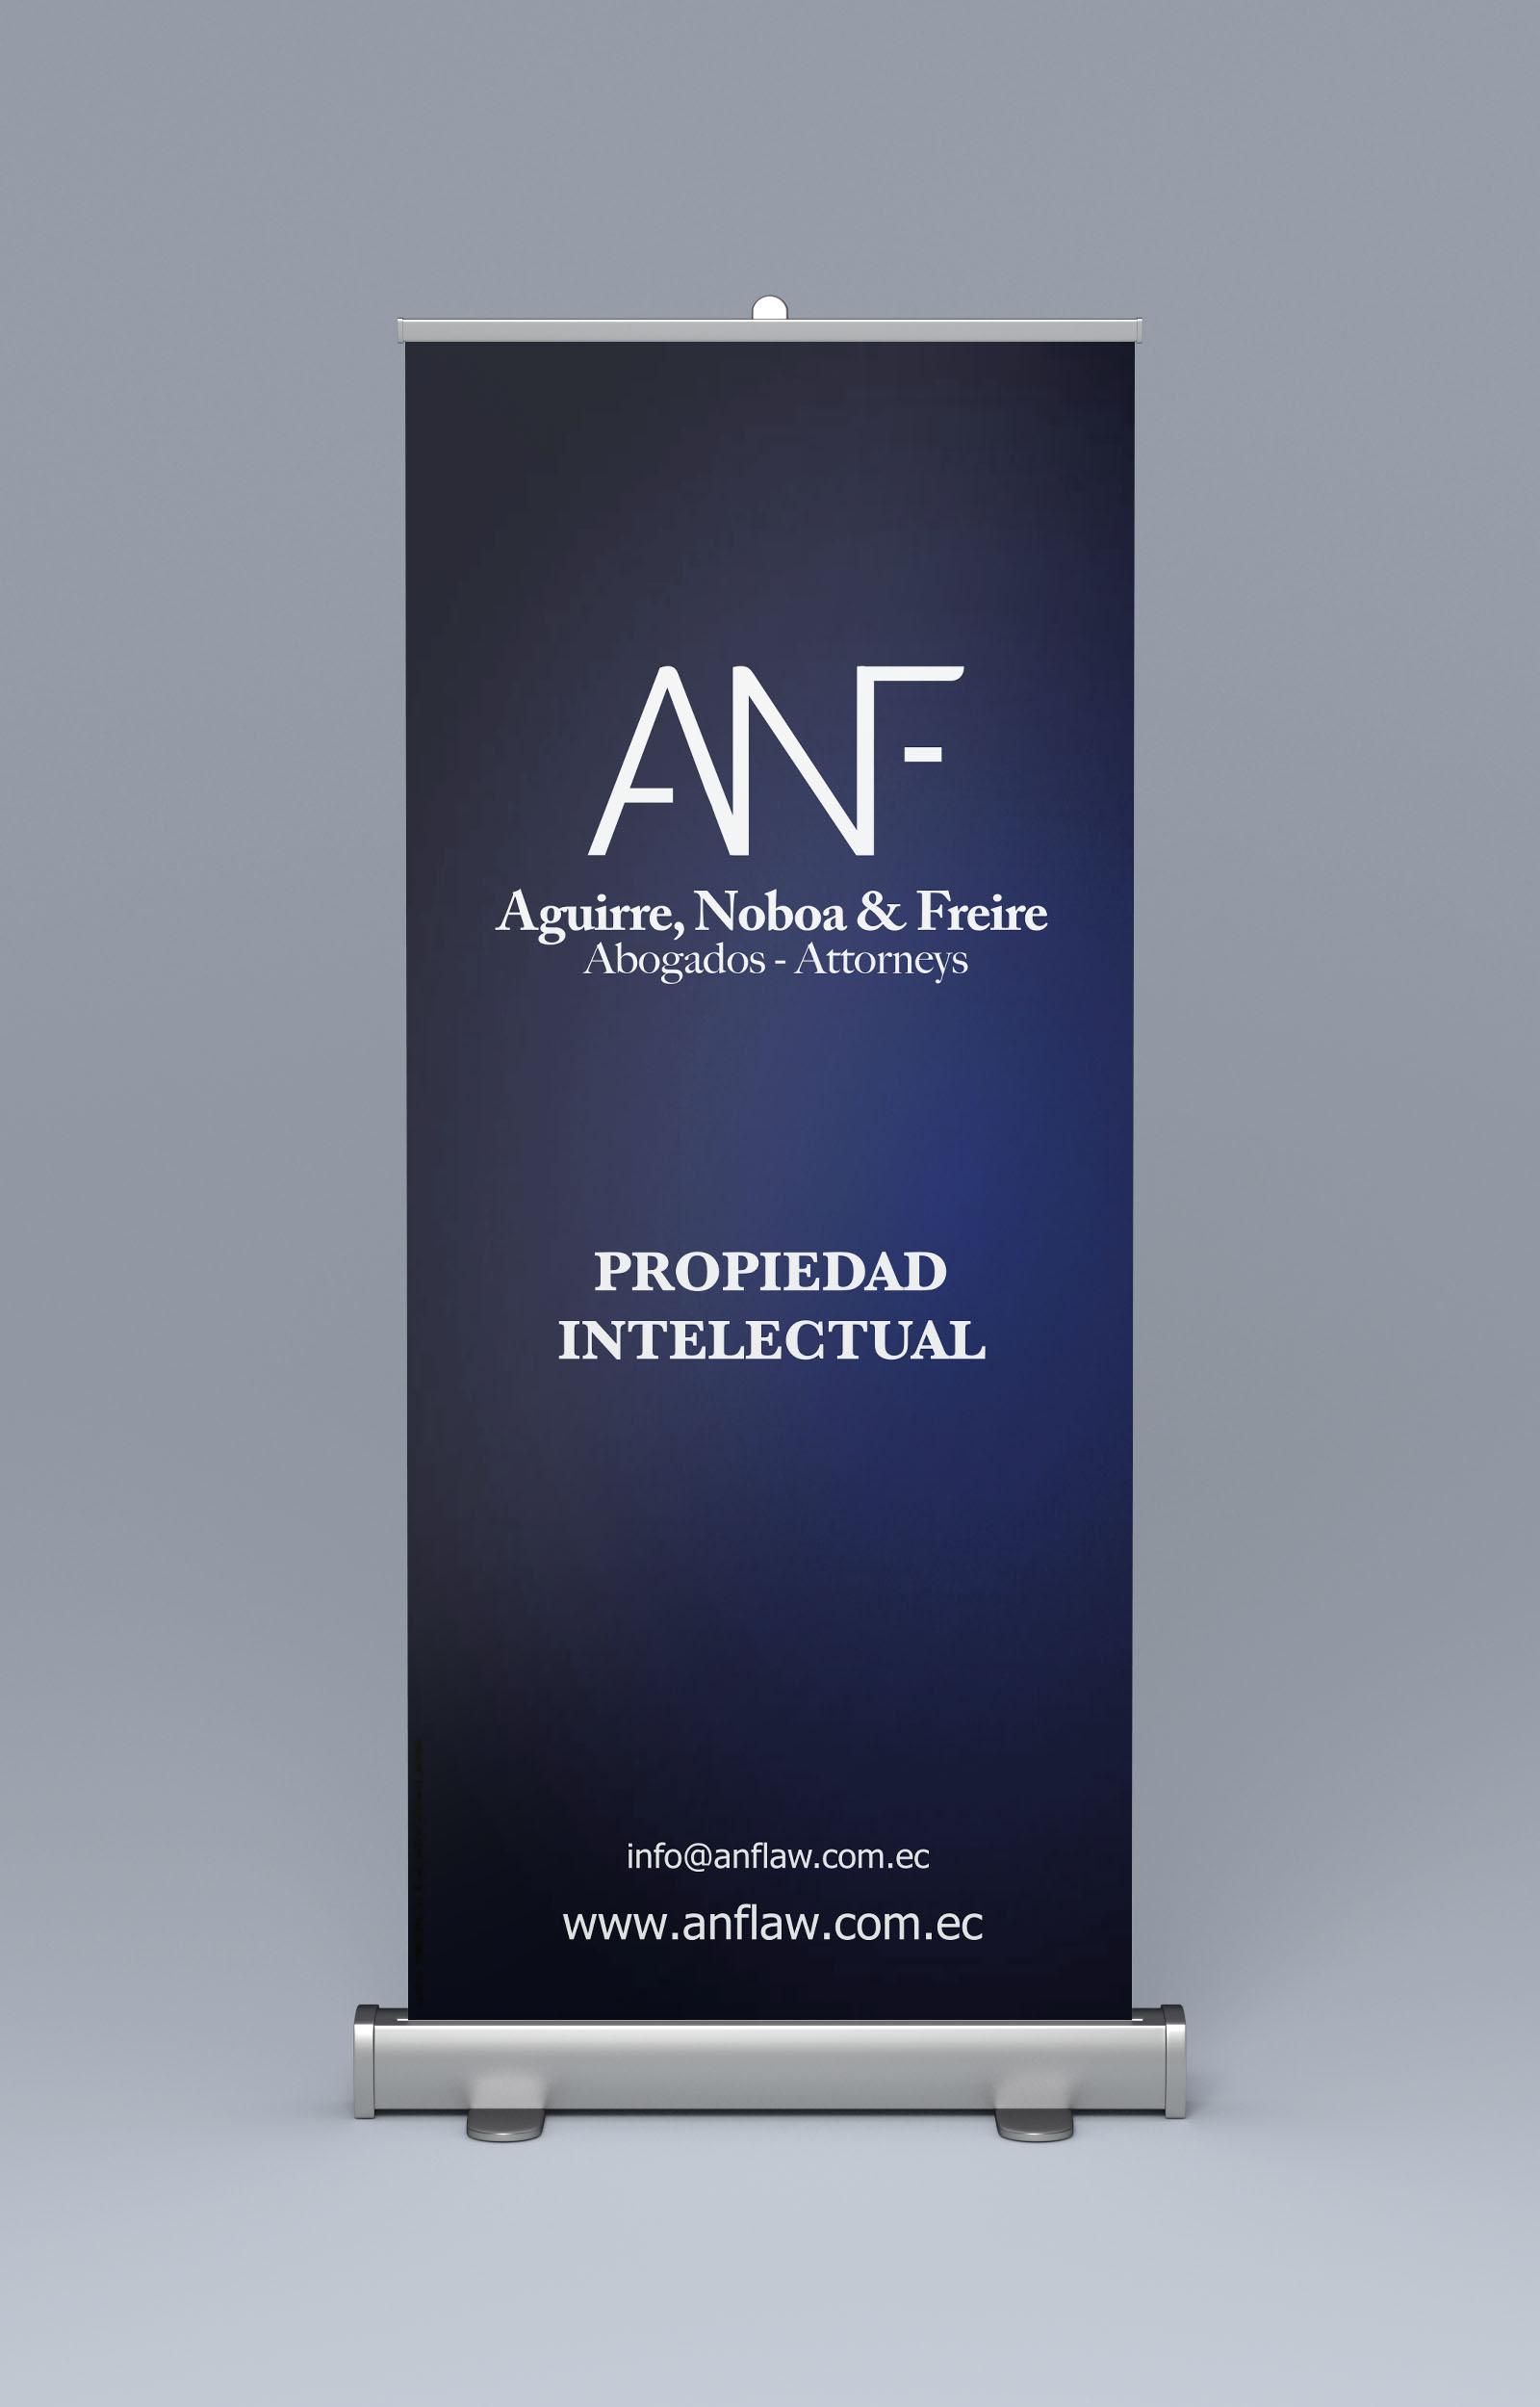 Rollup-ANF-2.jpg